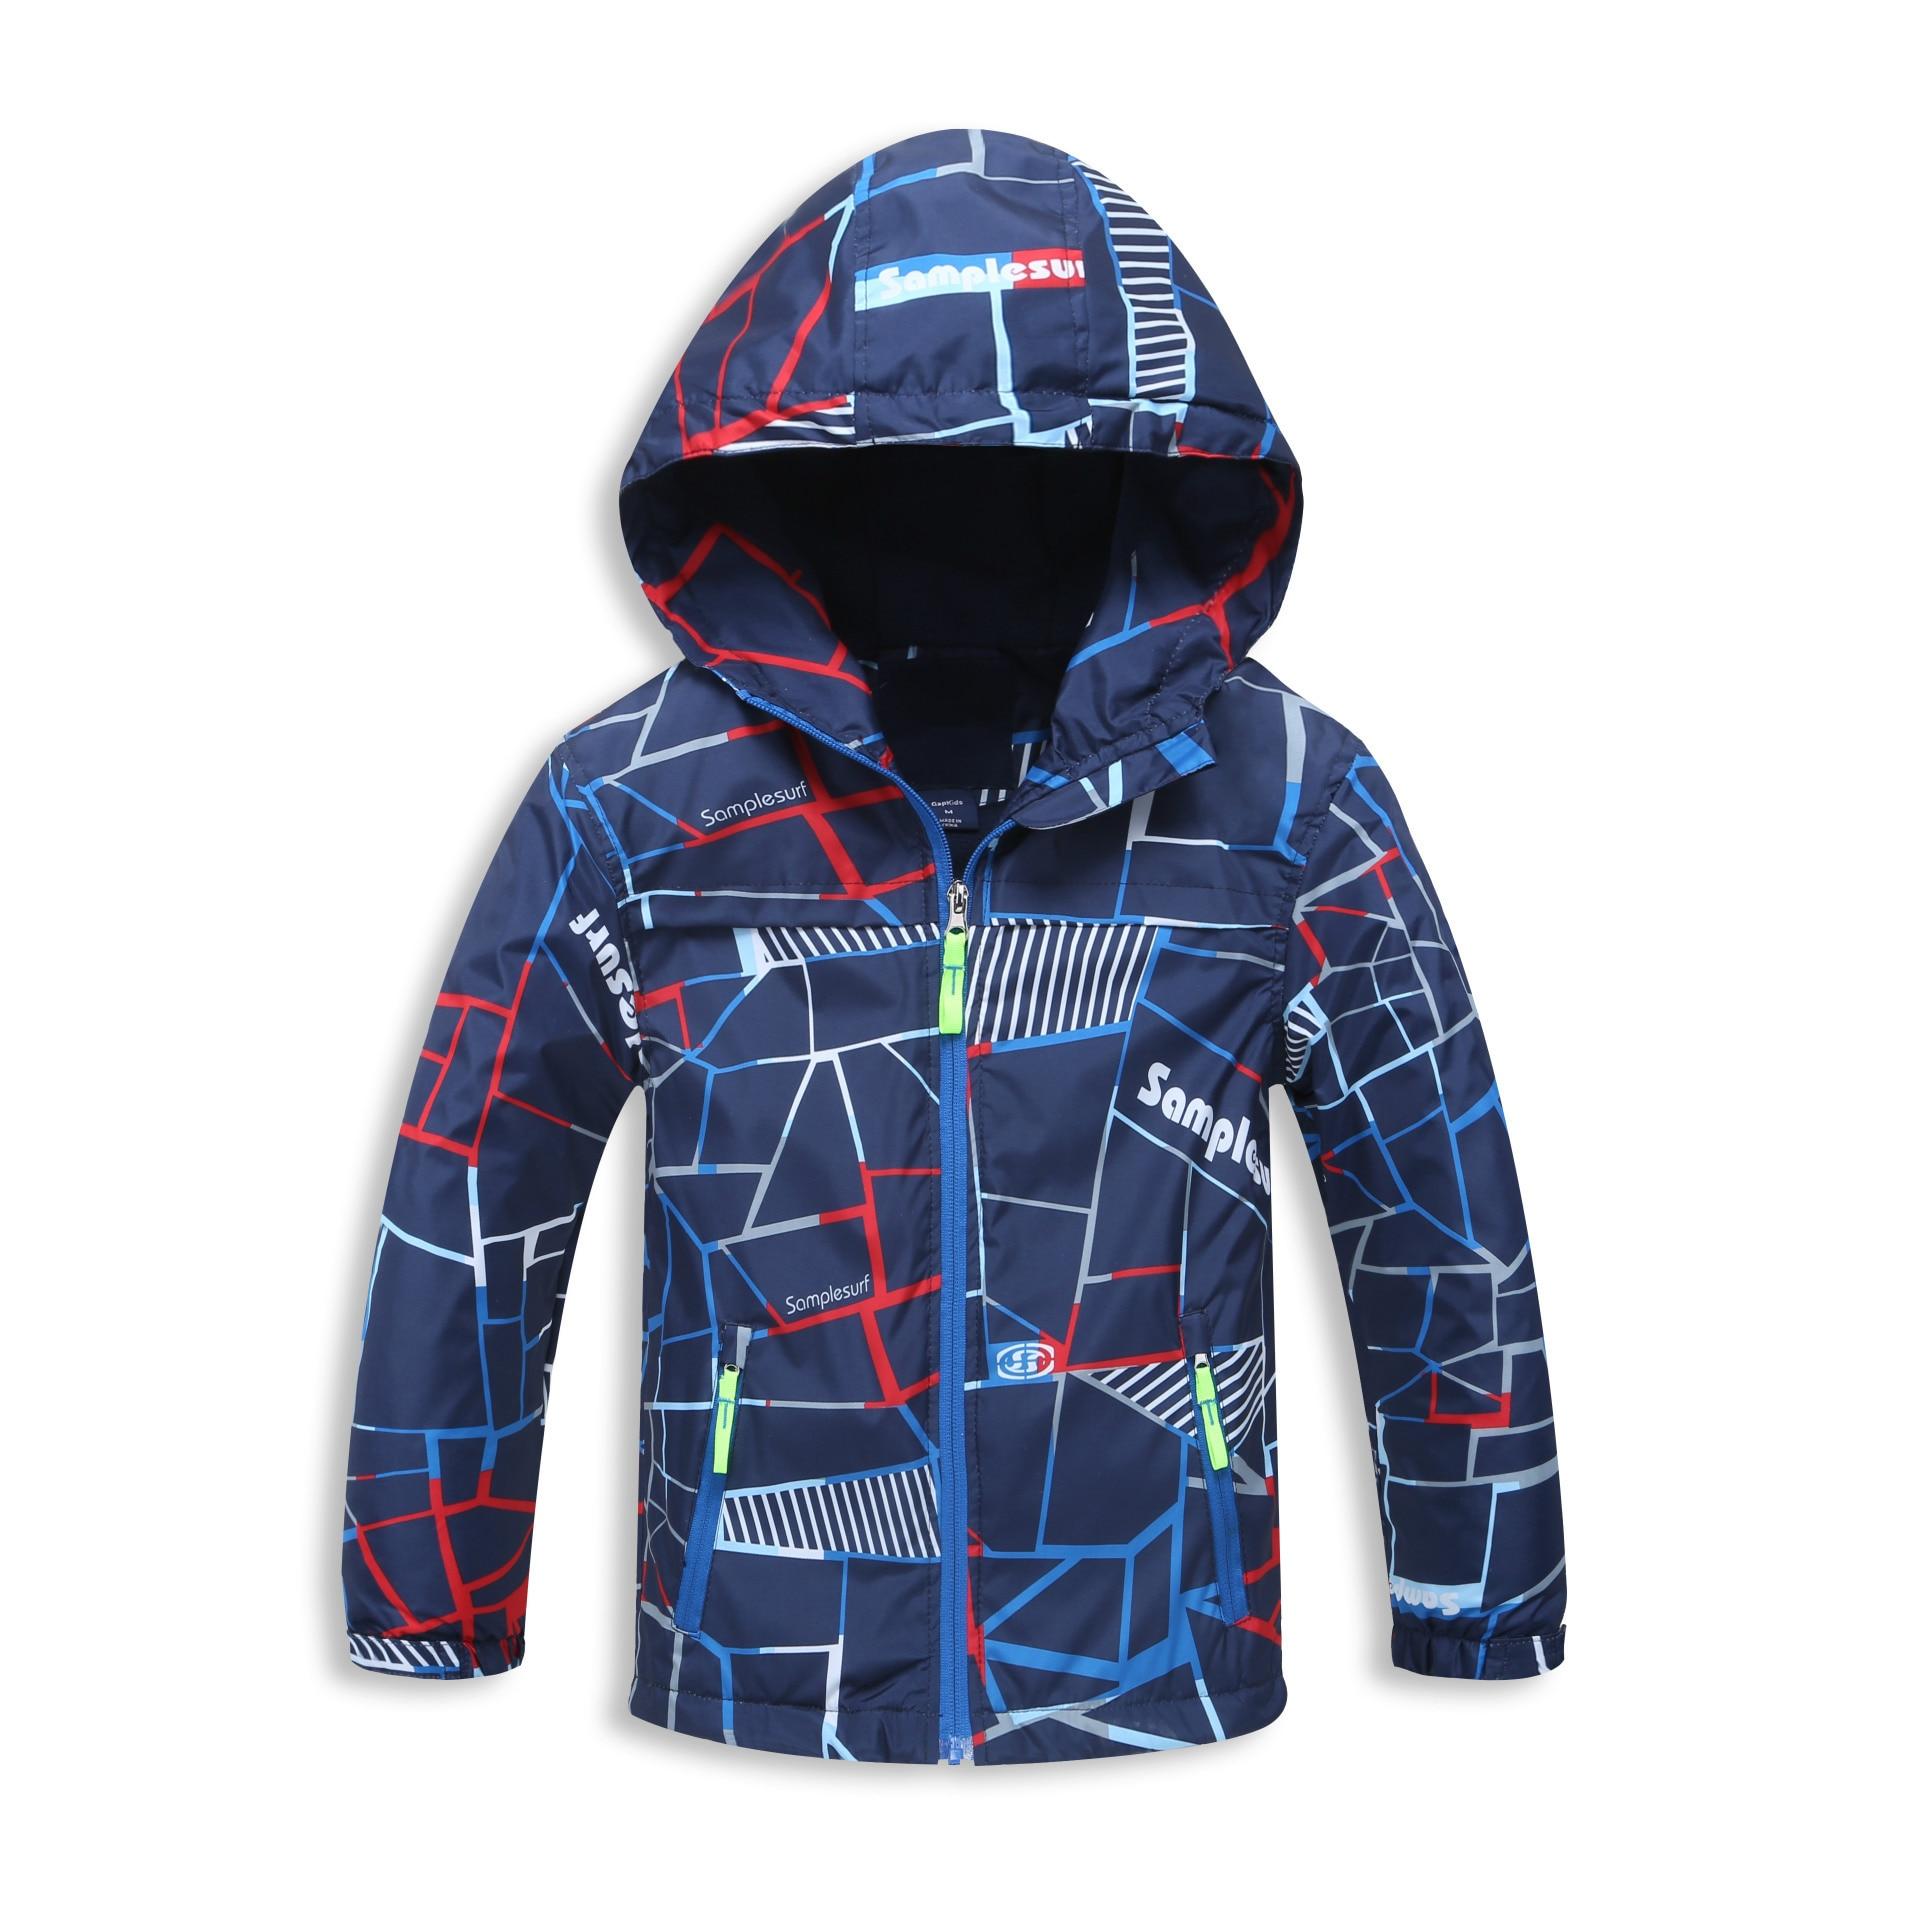 2017-Children-Jackets-Polar-Fleece-Autumn-Children-Outerwear-Coat-Sporty-Kids-Clothes-Waterproof-Windbreaker-Boys-Tops-For-3-12T-3